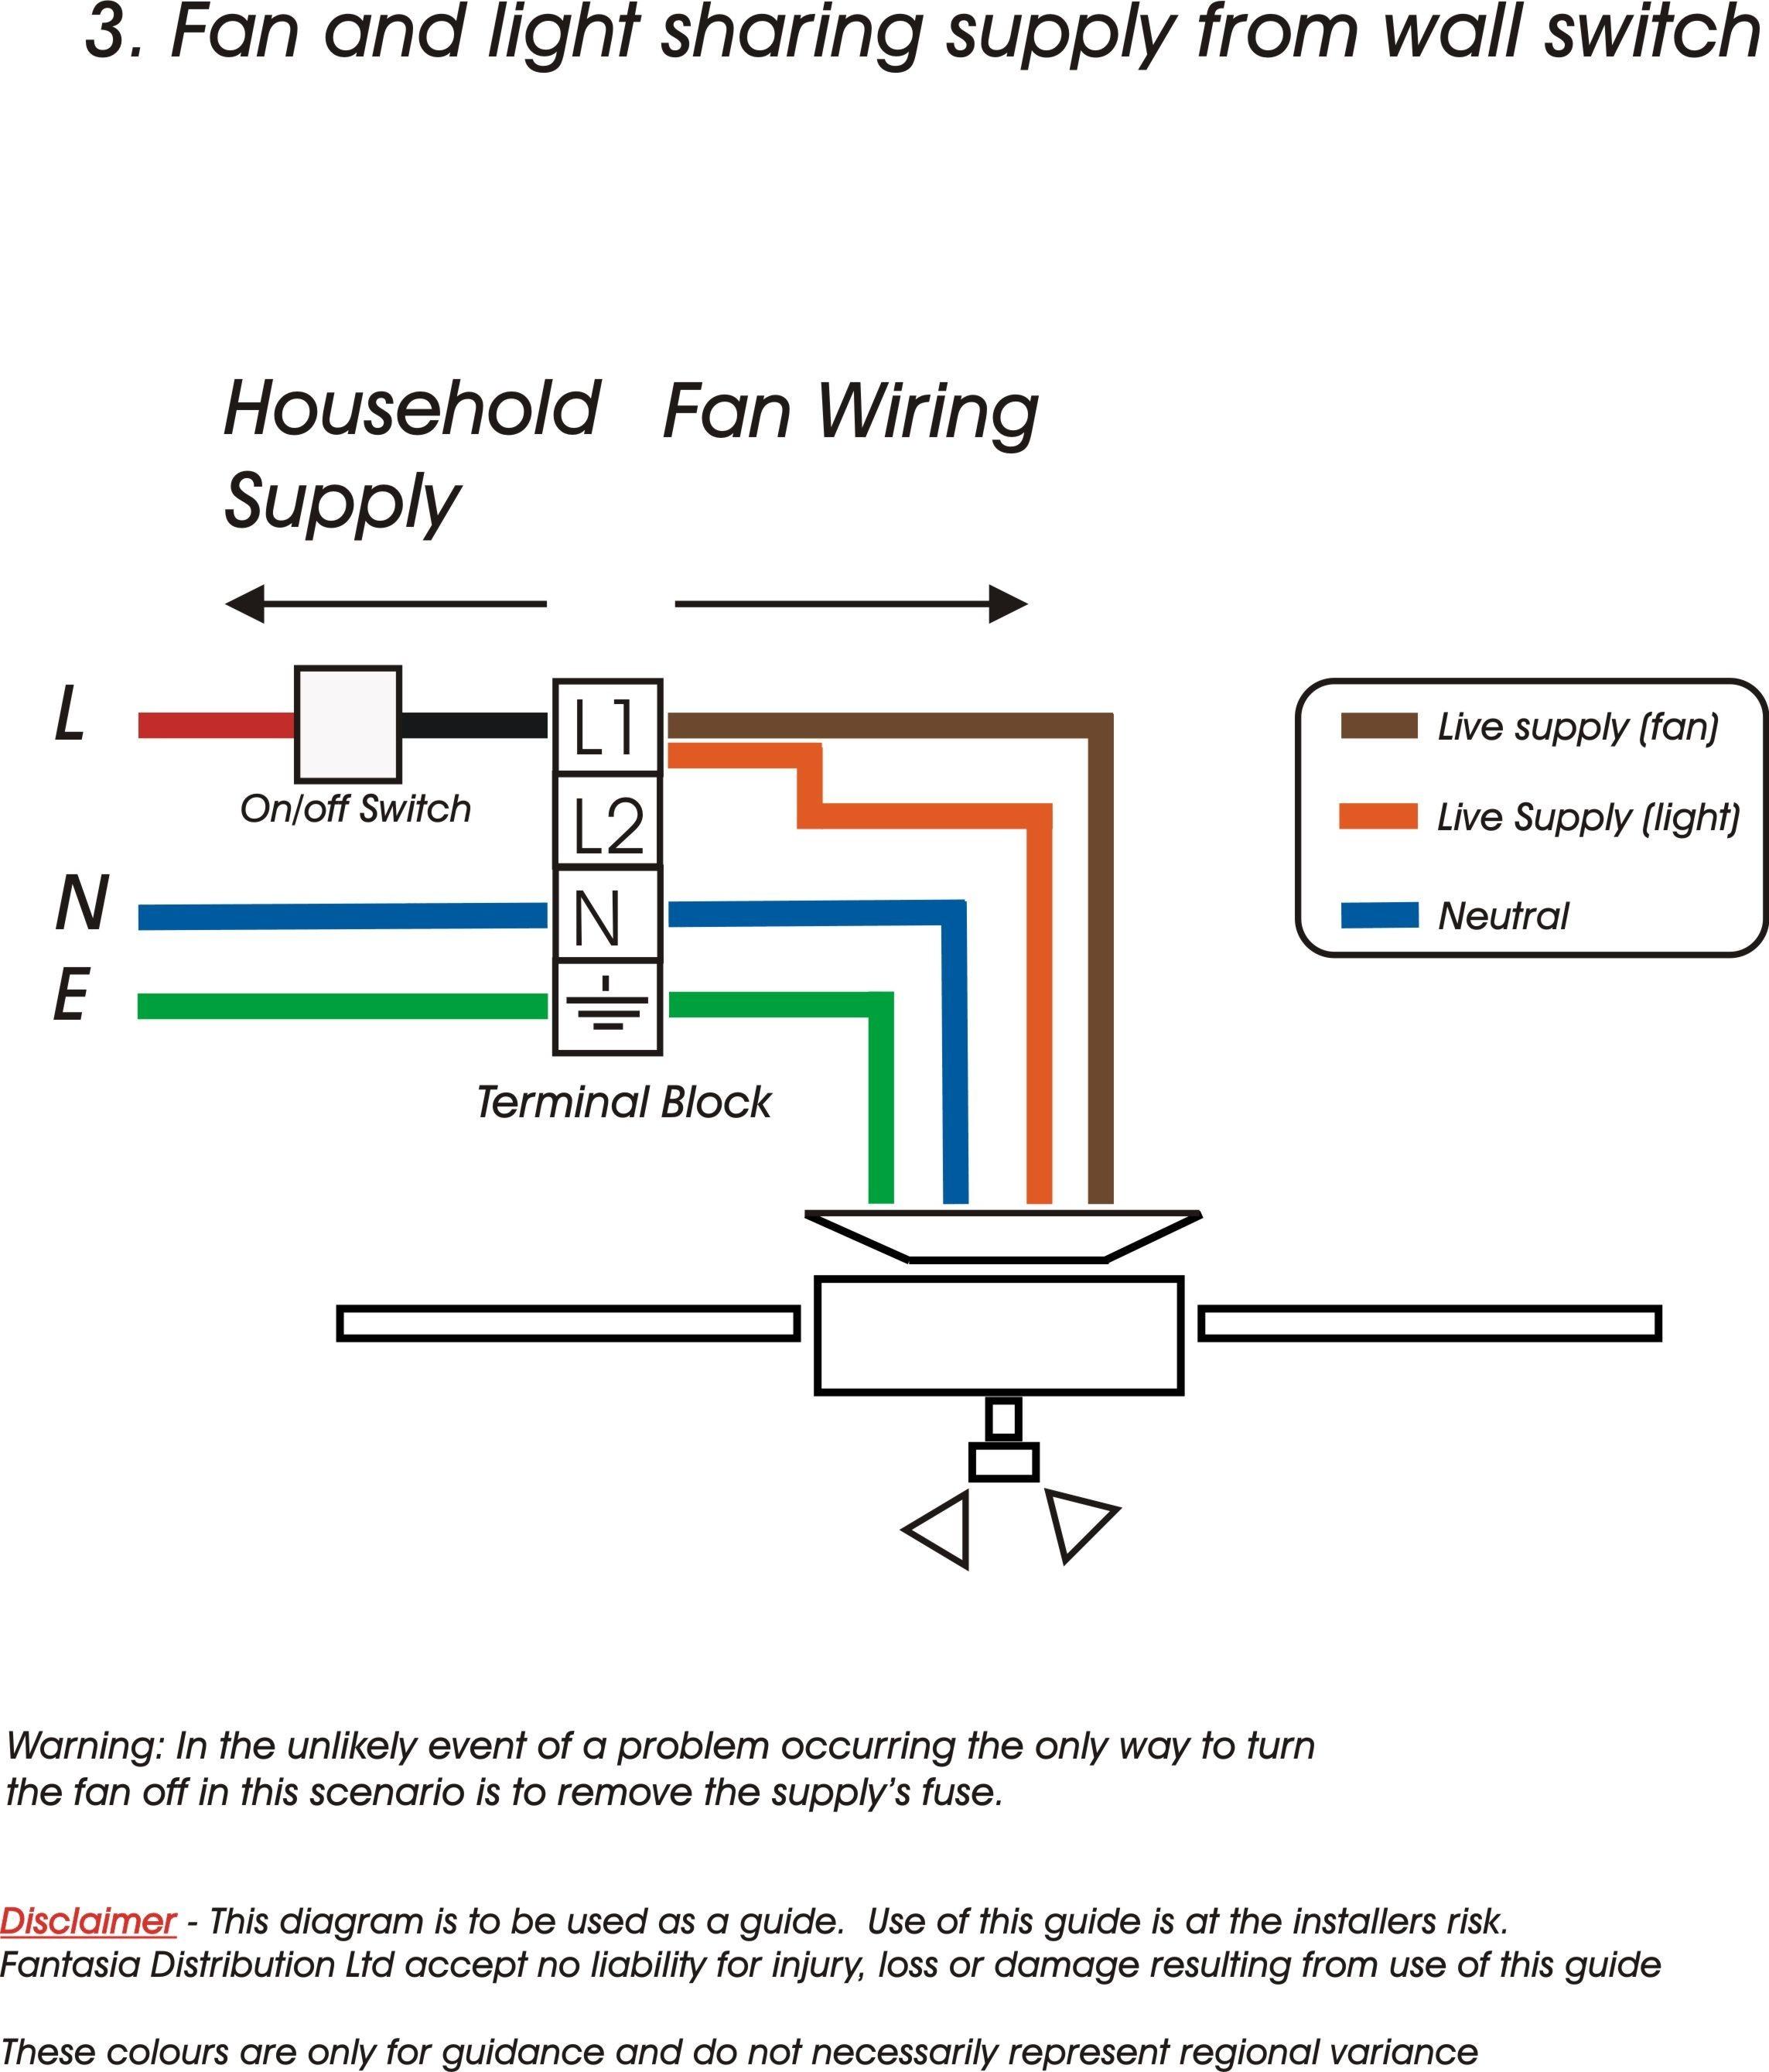 Hampton Bay Ceiling Fan Switch Wiring Diagram Hampton Bay Ceiling Fan Remote Wiring Diagram Best Control Wiring Of Hampton Bay Ceiling Fan Switch Wiring Diagram